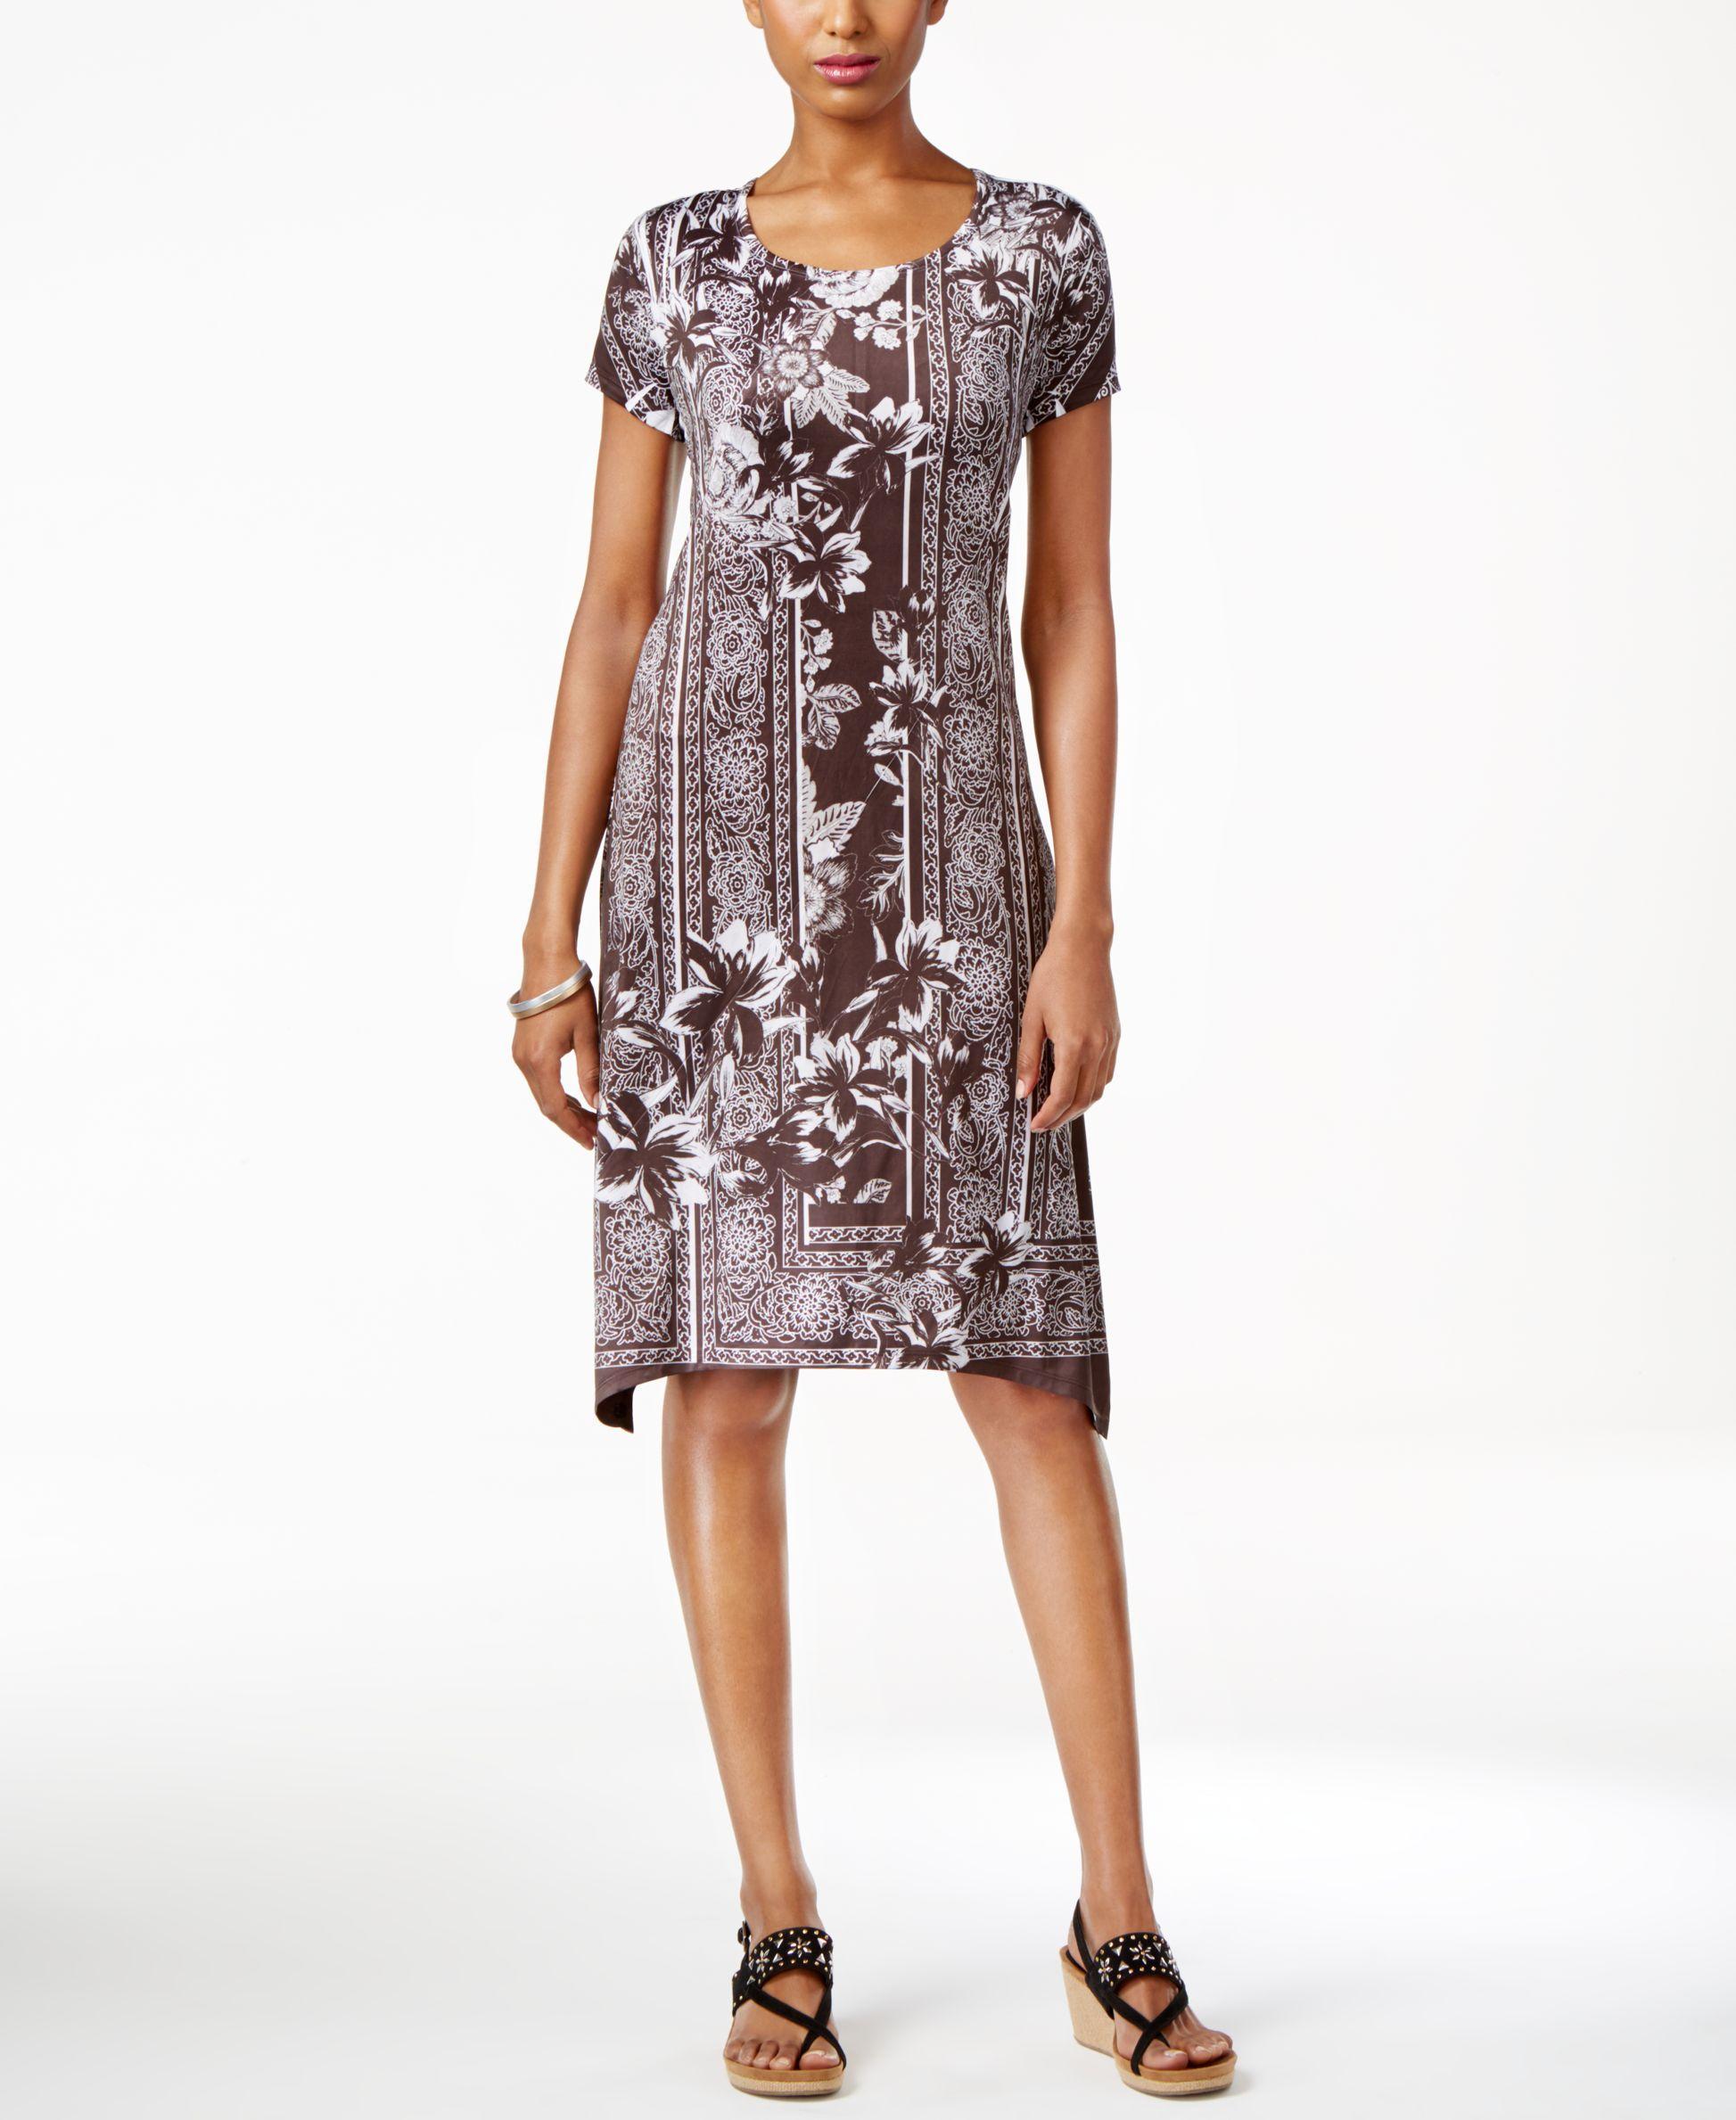 be4b55713a67e Style & Co Petite Printed Cap-Sleeve Swing Dress, Created for Macy's -  Dresses - Petites - Macy's